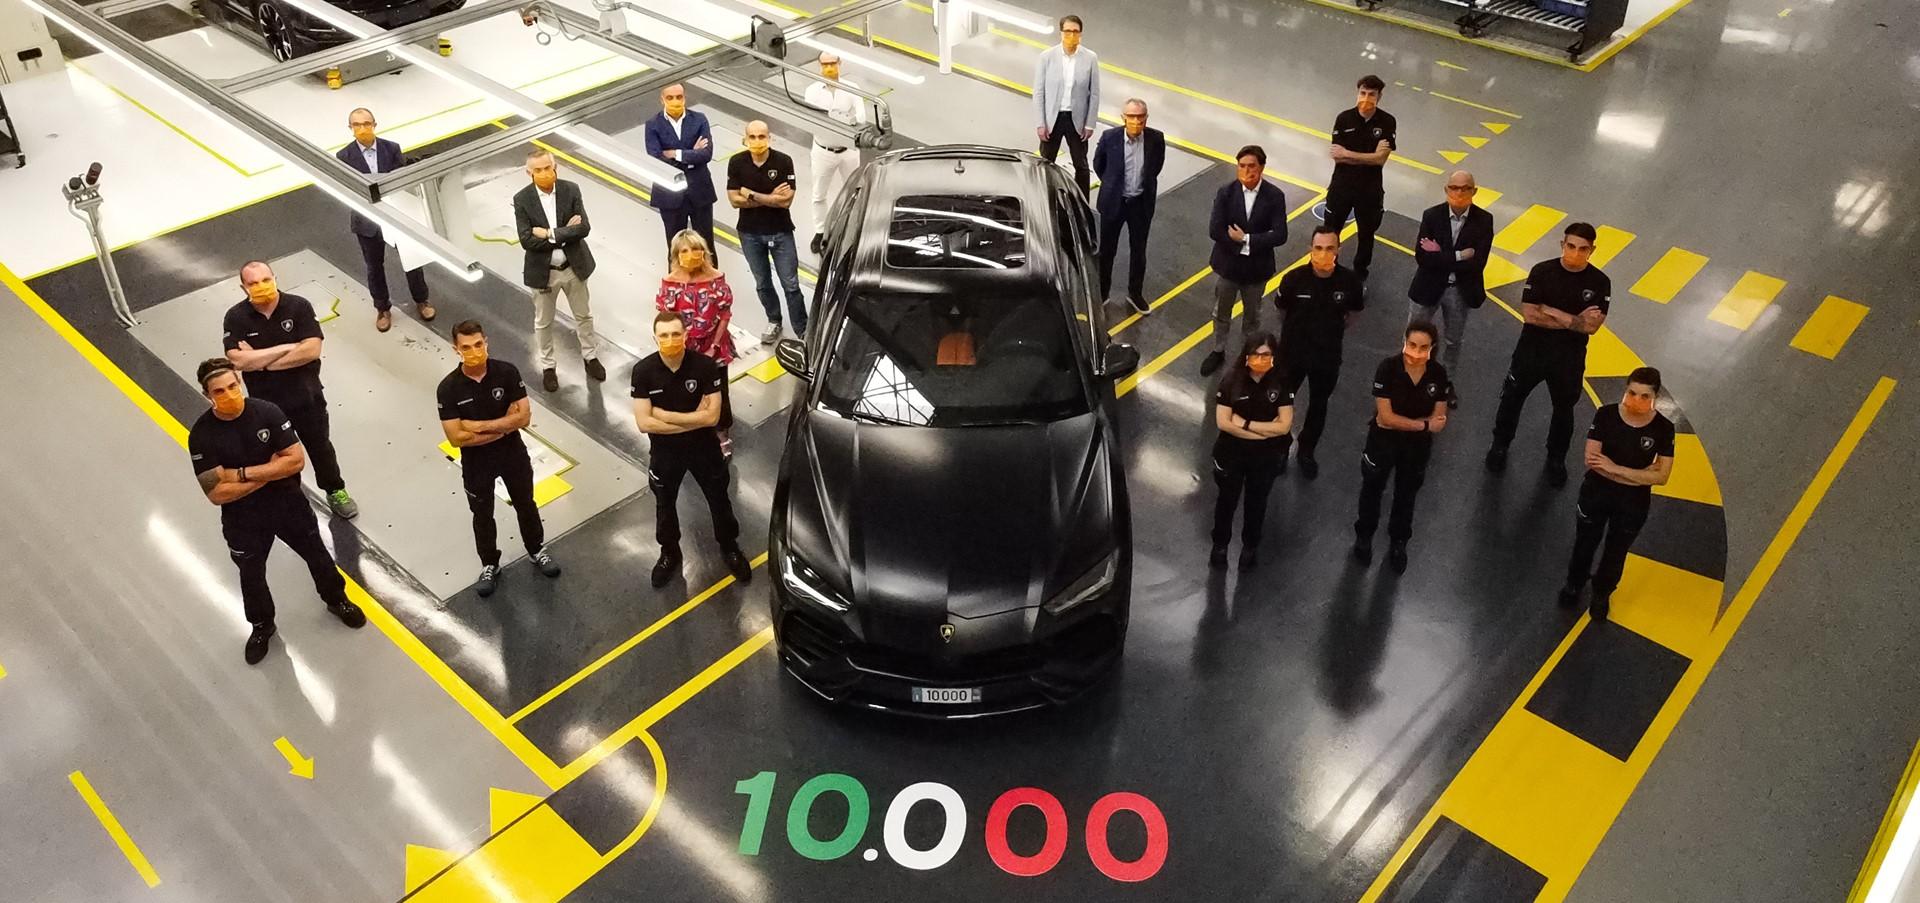 Automobili Lamborghini celebrates the 10,000th Urus